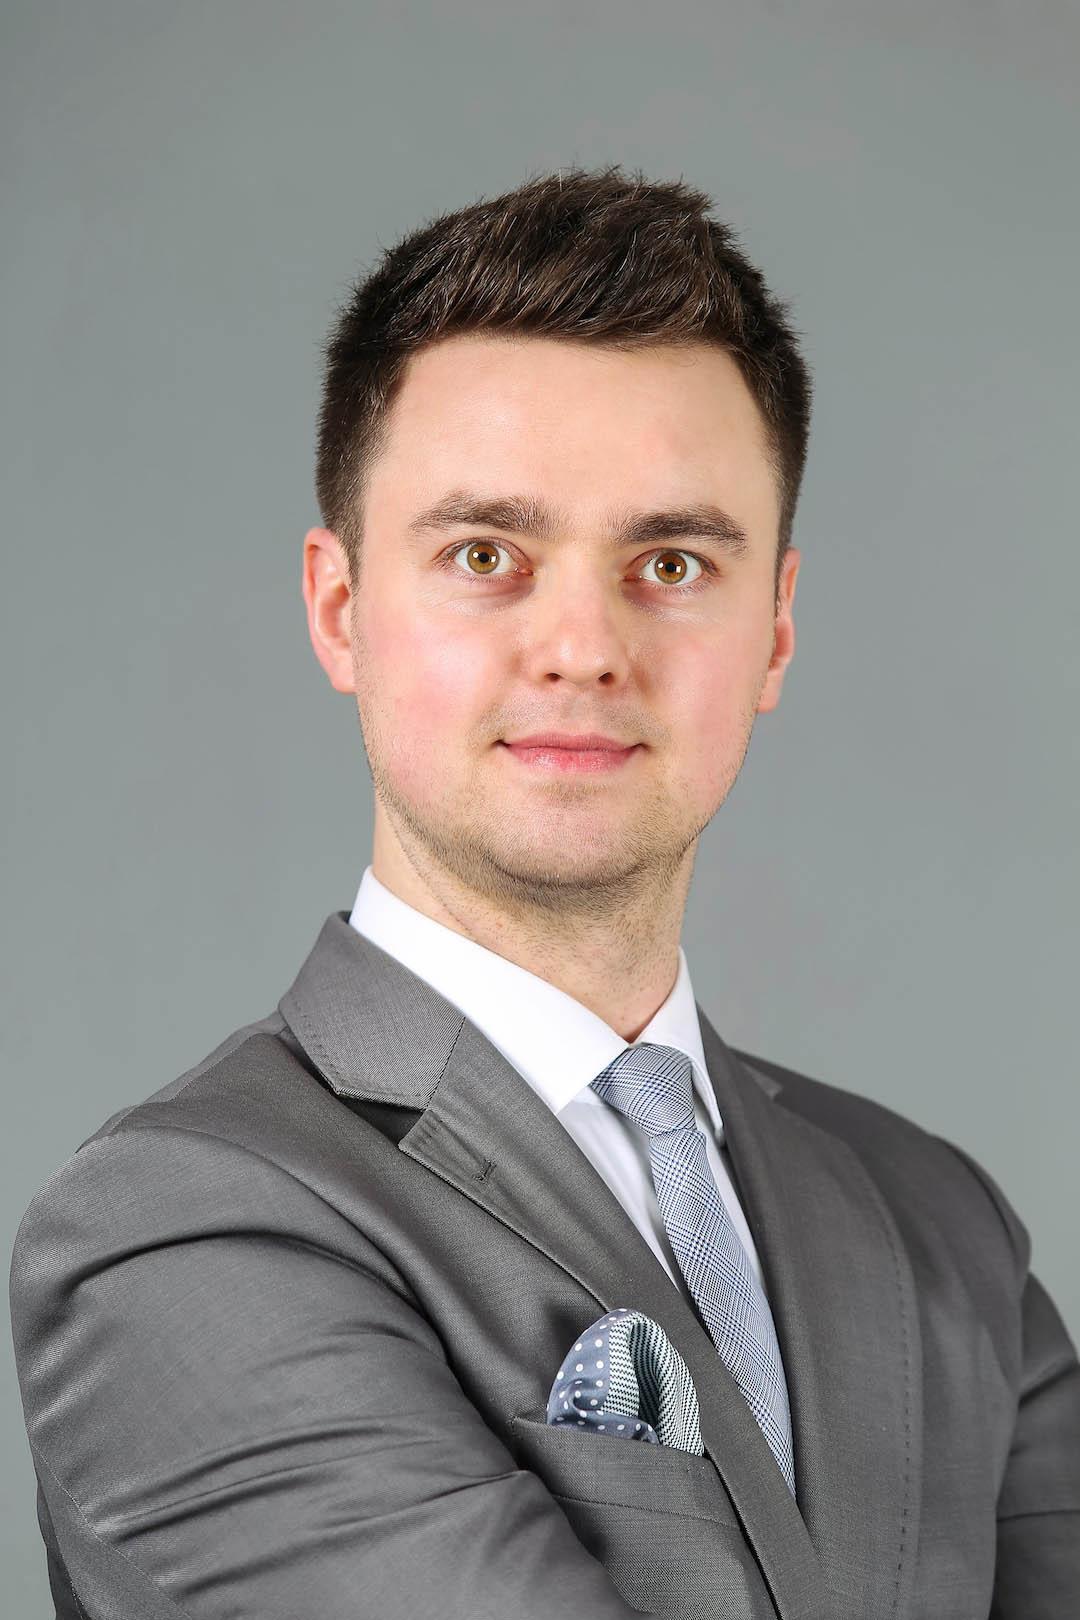 jakub_rajnik_nieruchomosci